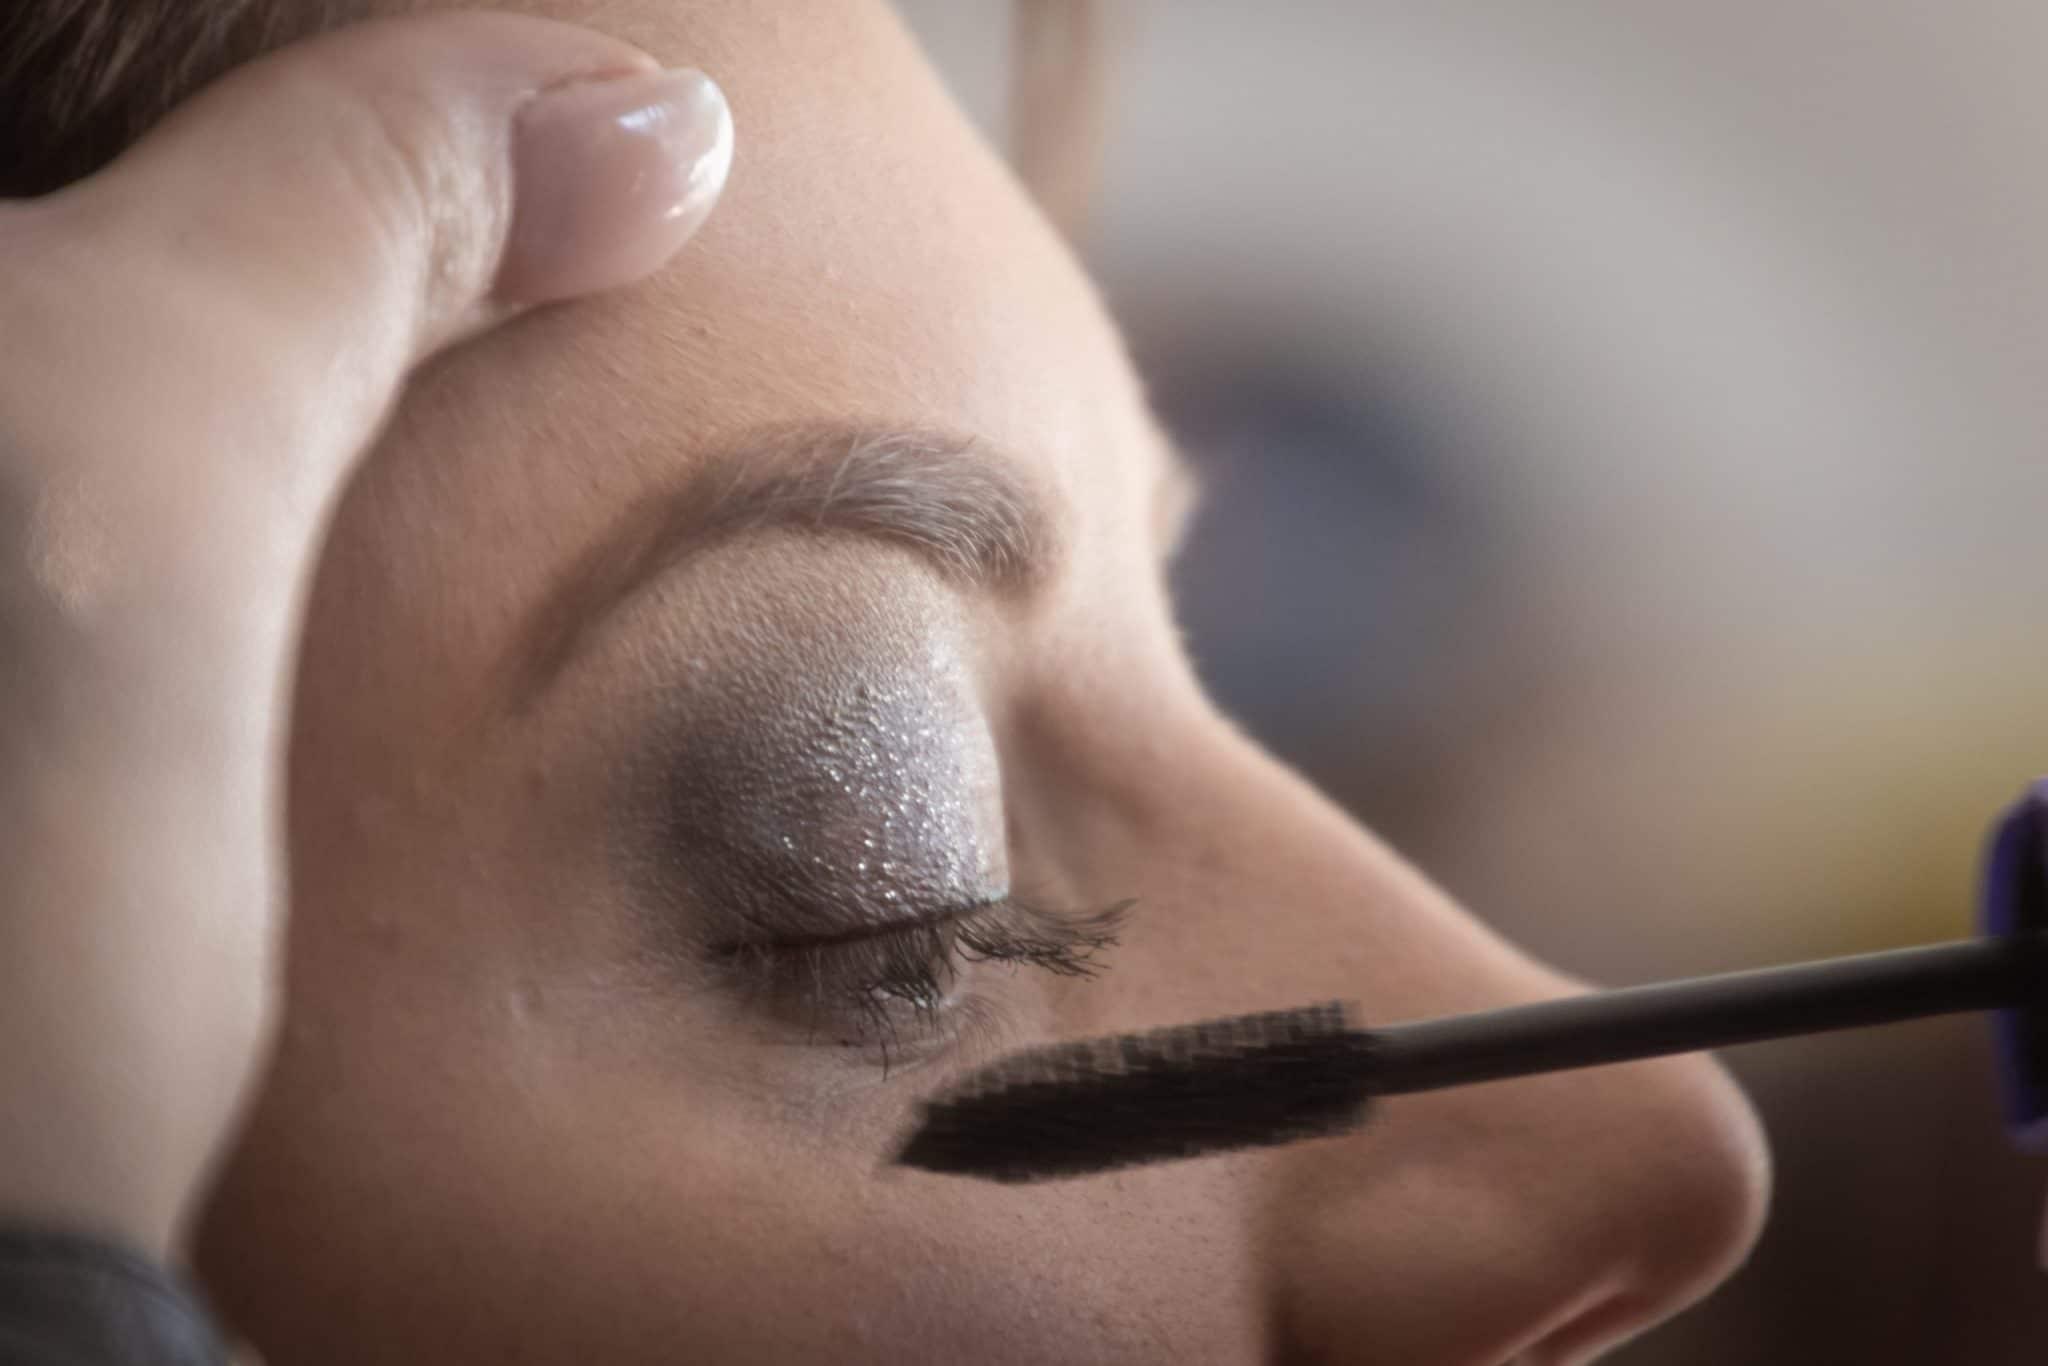 Eye makeup & Mascara cosmetics